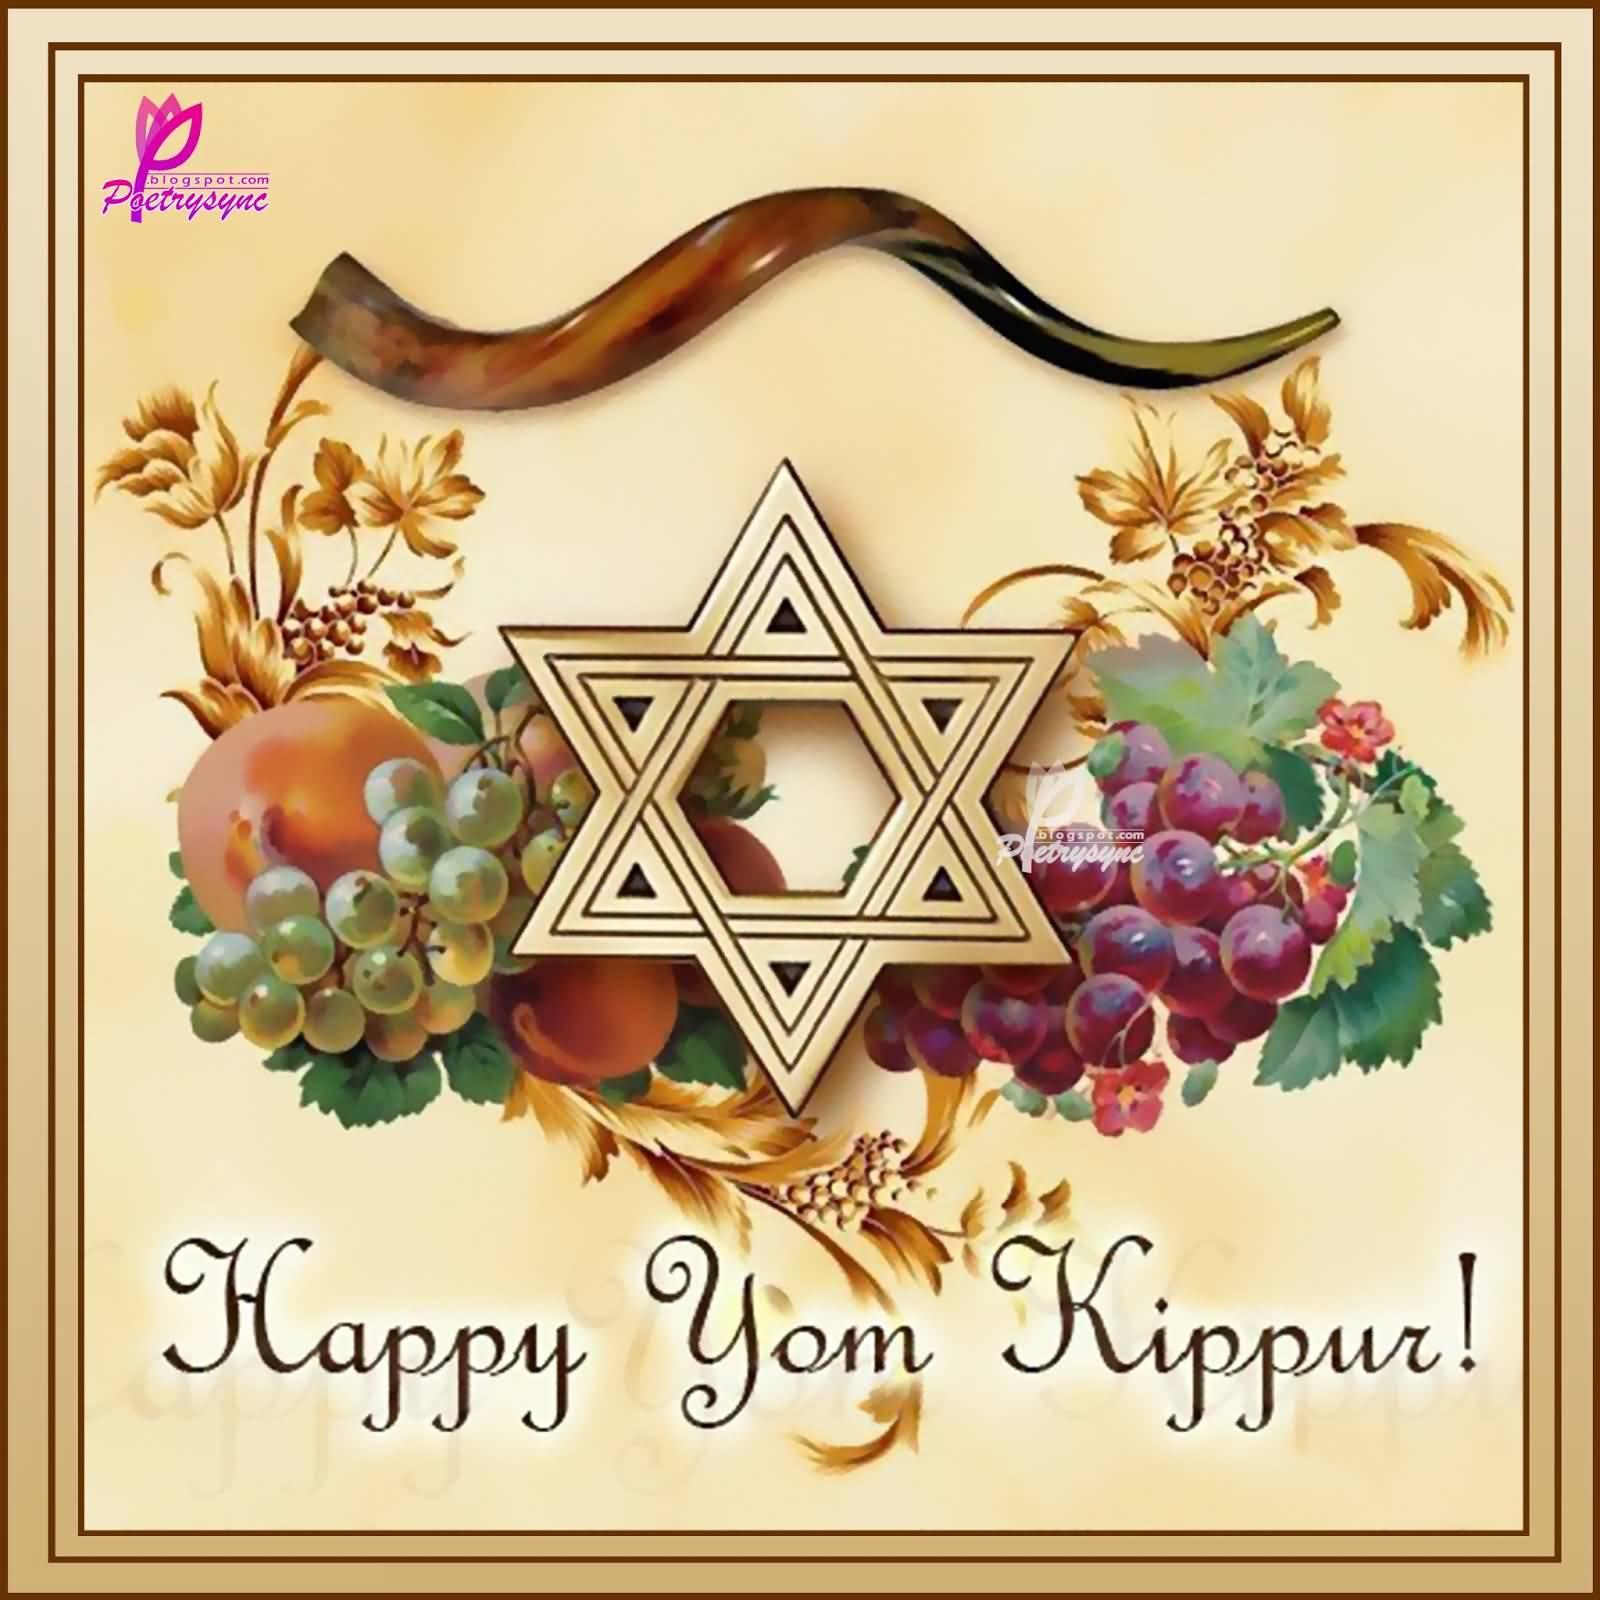 Happy Yom Kippur 2017 Greeting All New And Latest Yom Kippur